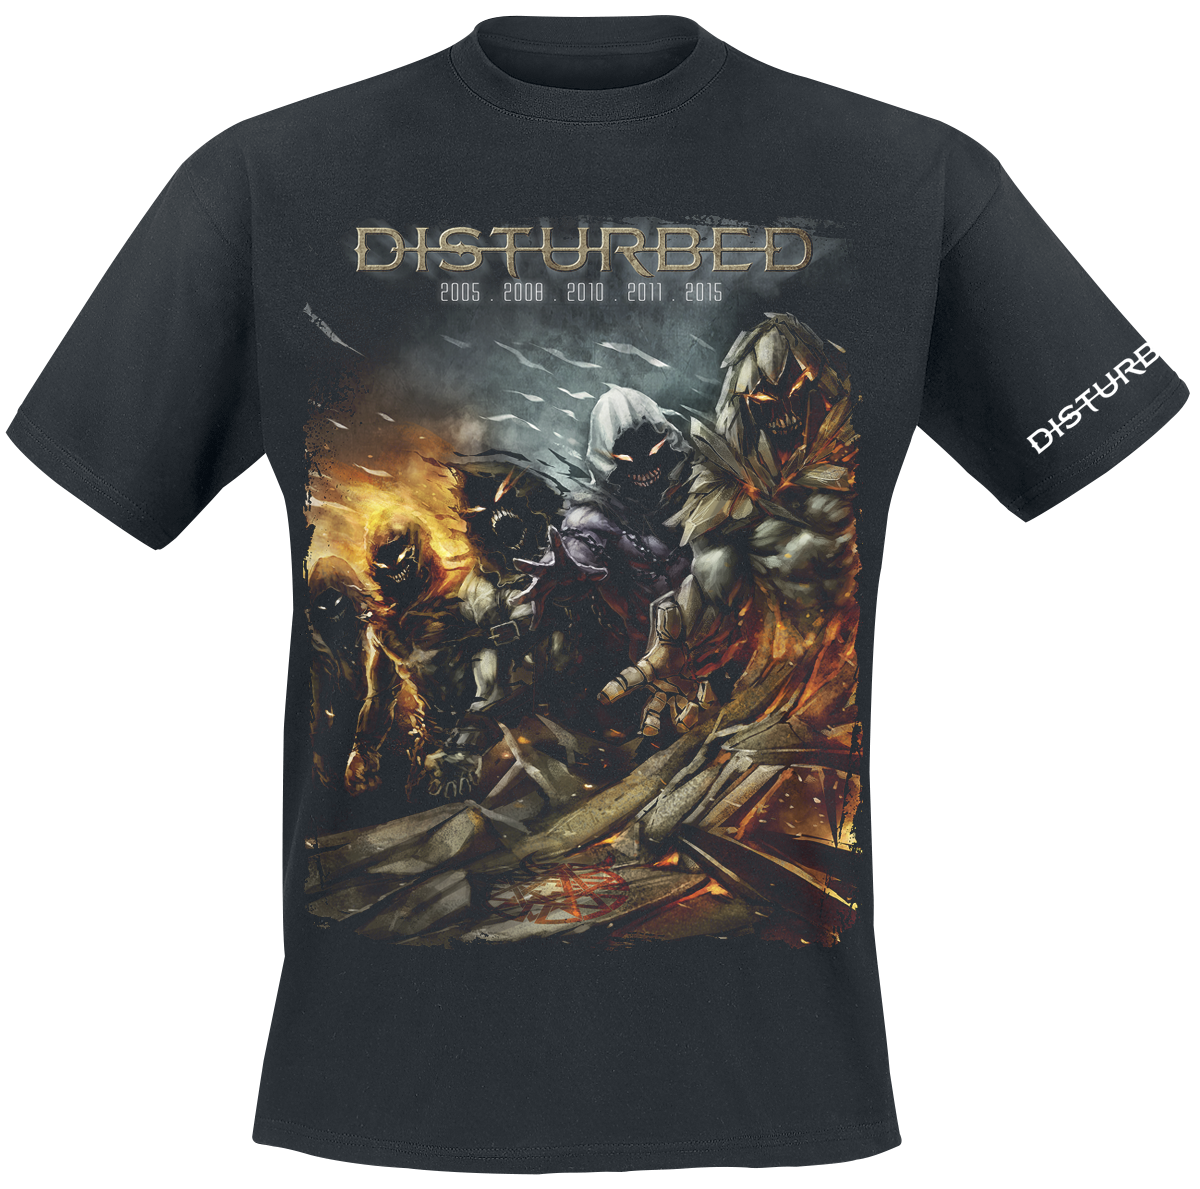 Disturbed - Evolution - The Guy - T-Shirt - black image